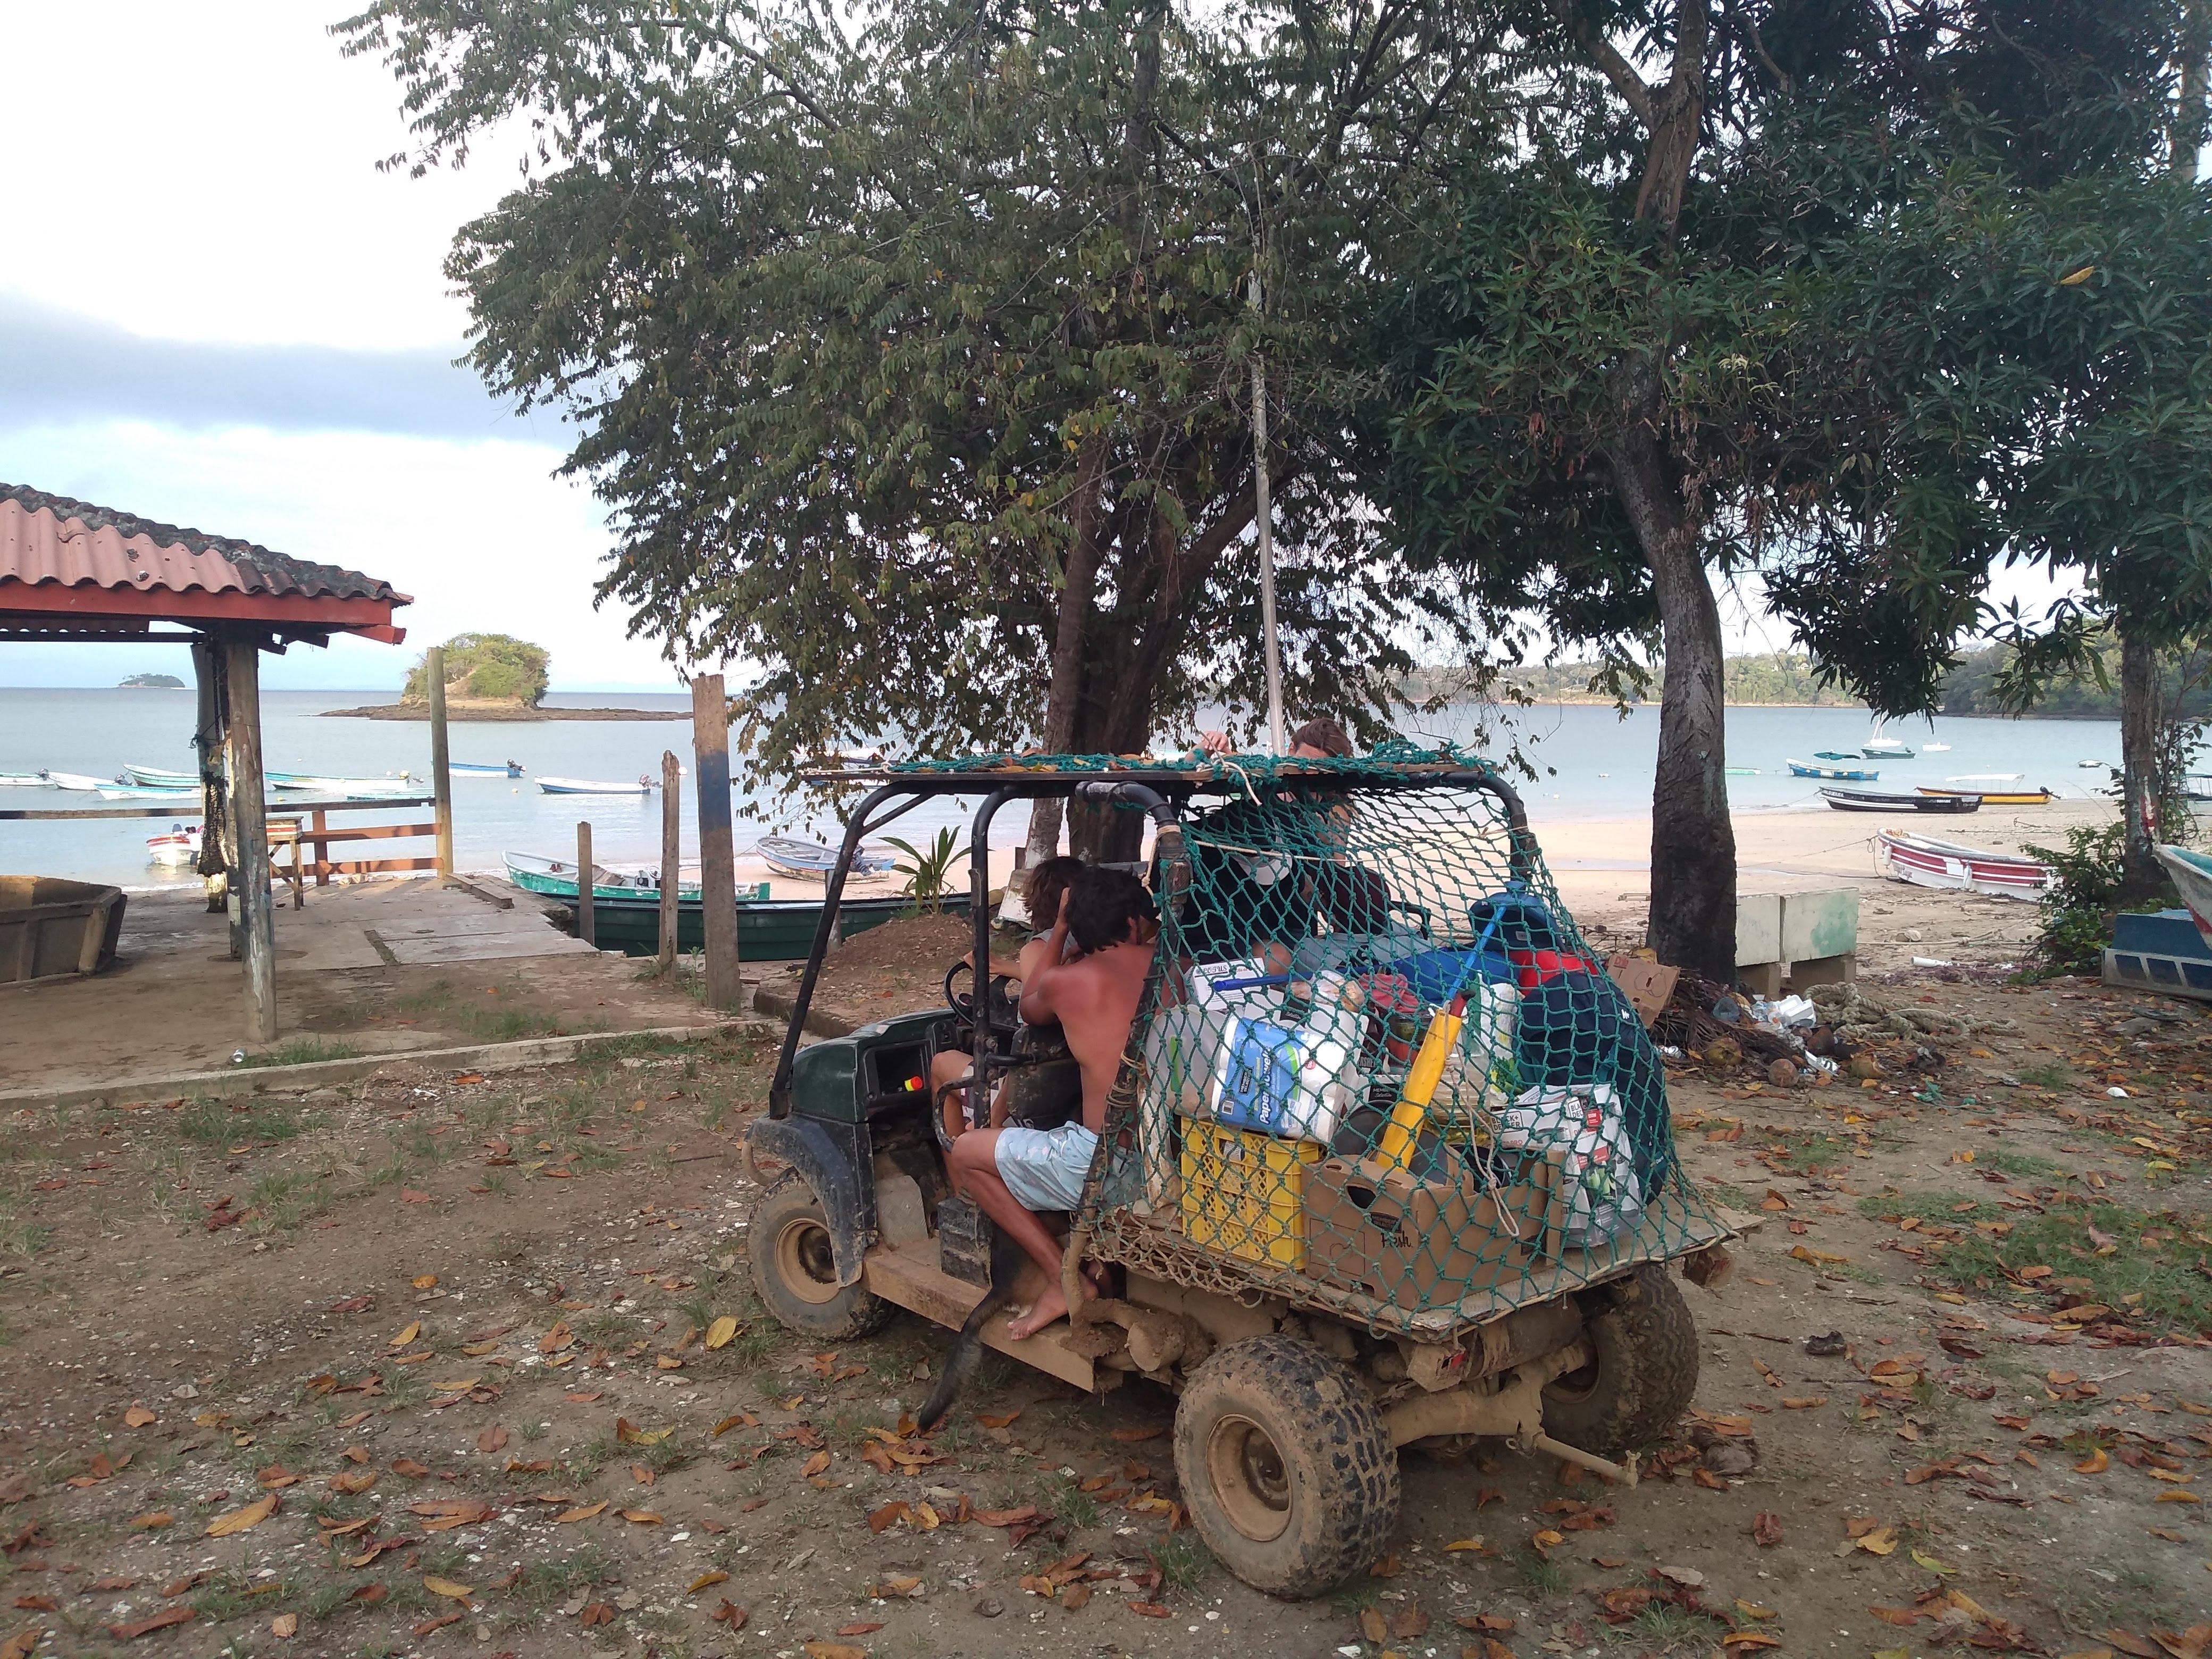 Land transportation